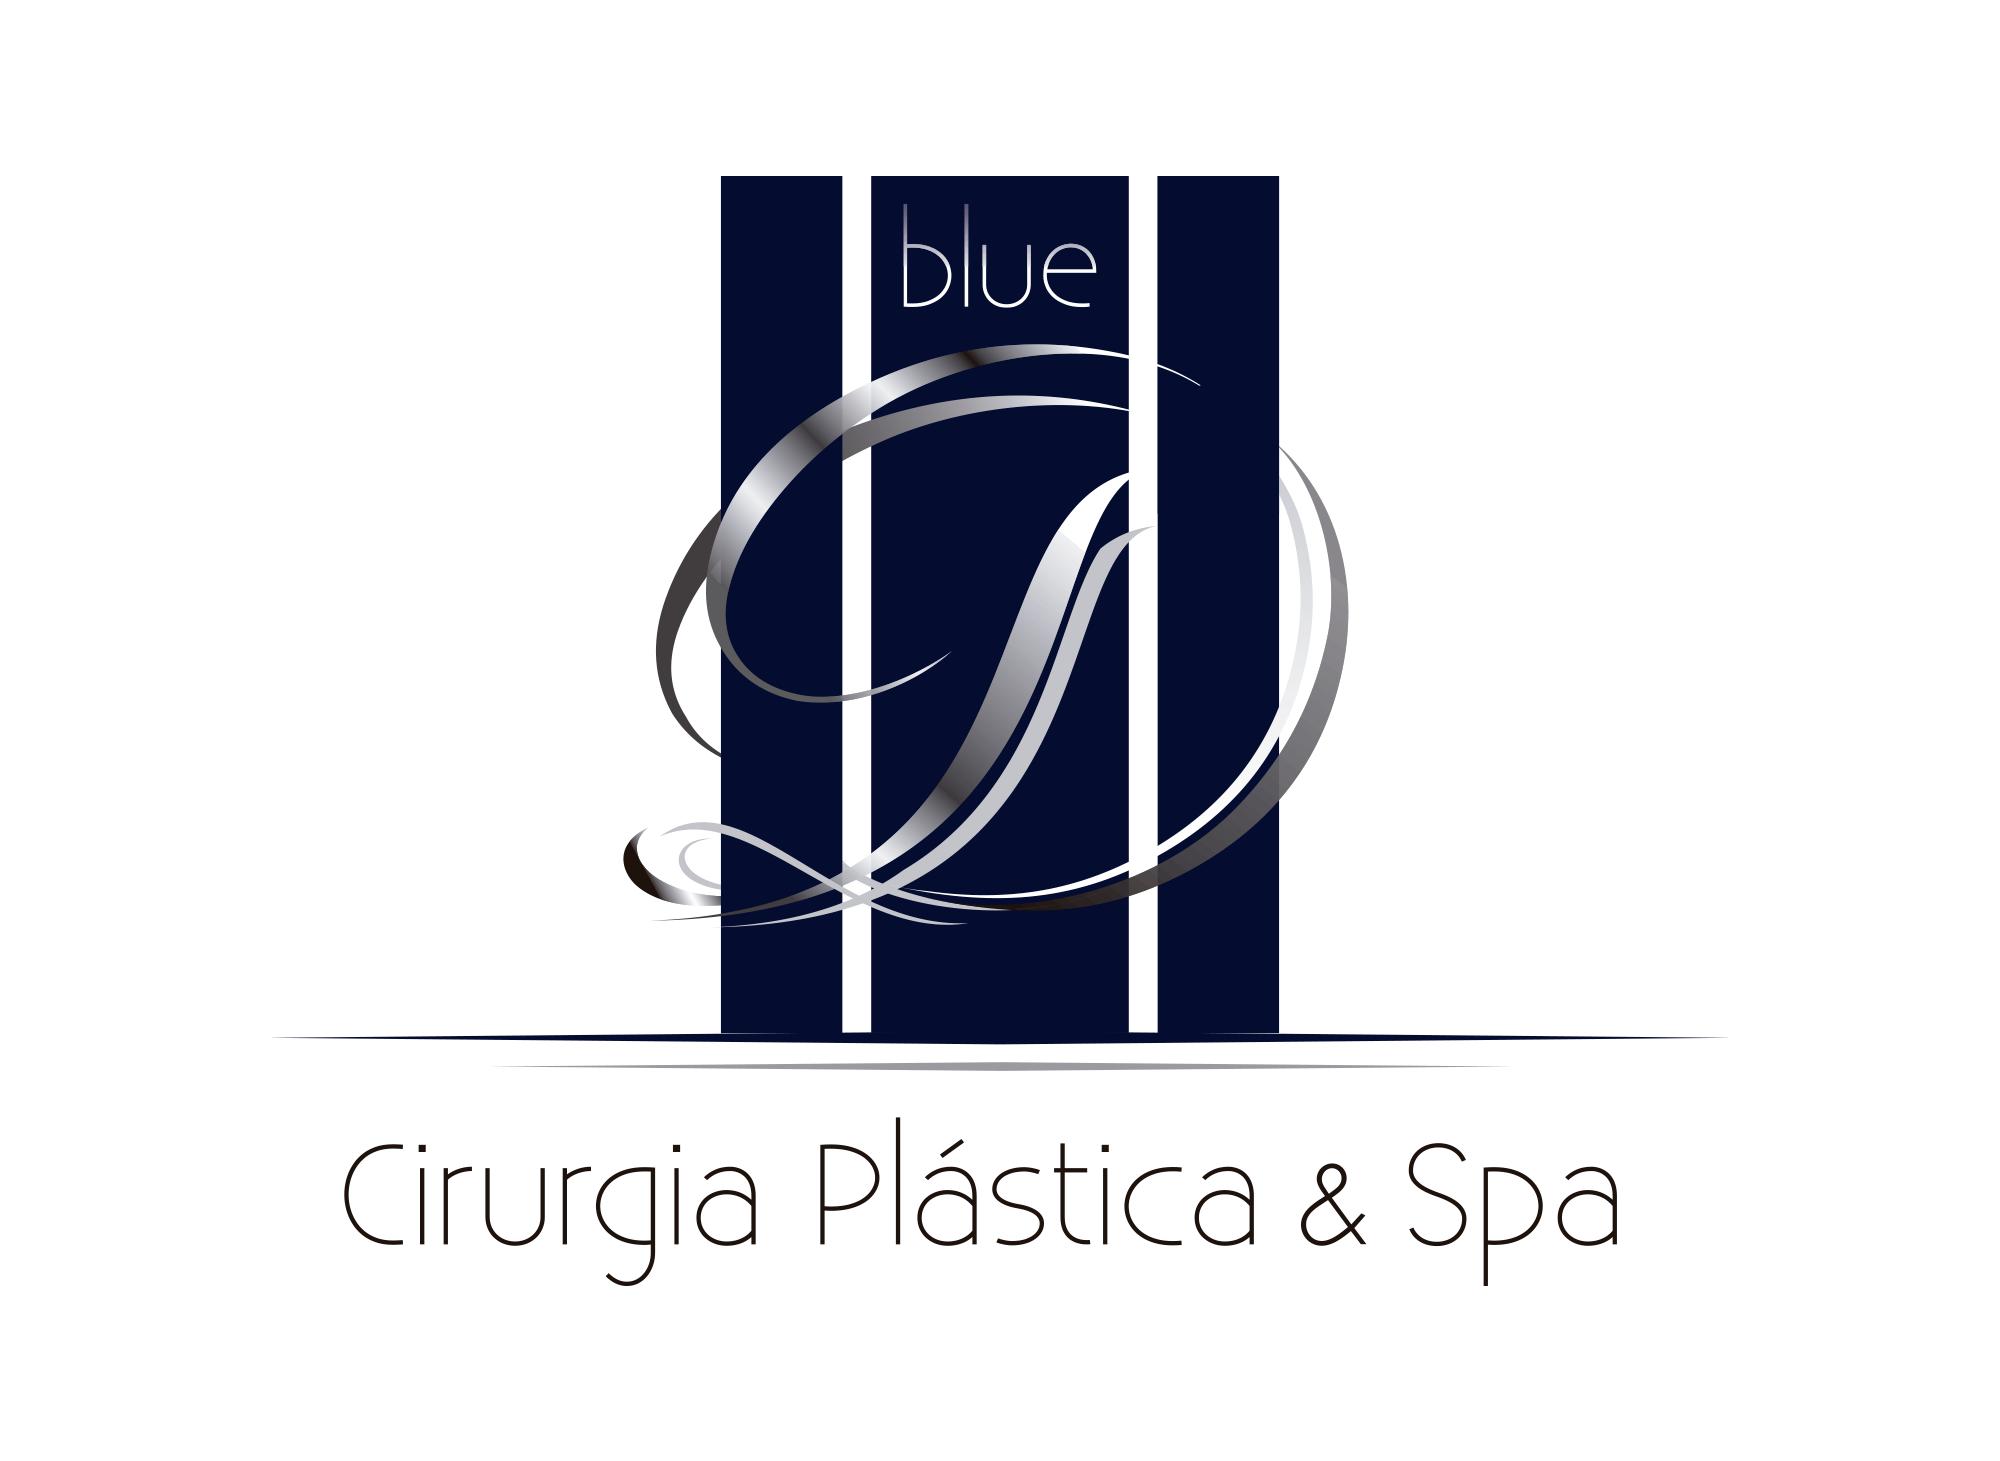 blue-d-cirurgia-plastica-spa-clientes-atendidos-agencia-diretriz-digital-marketing-fortaleza